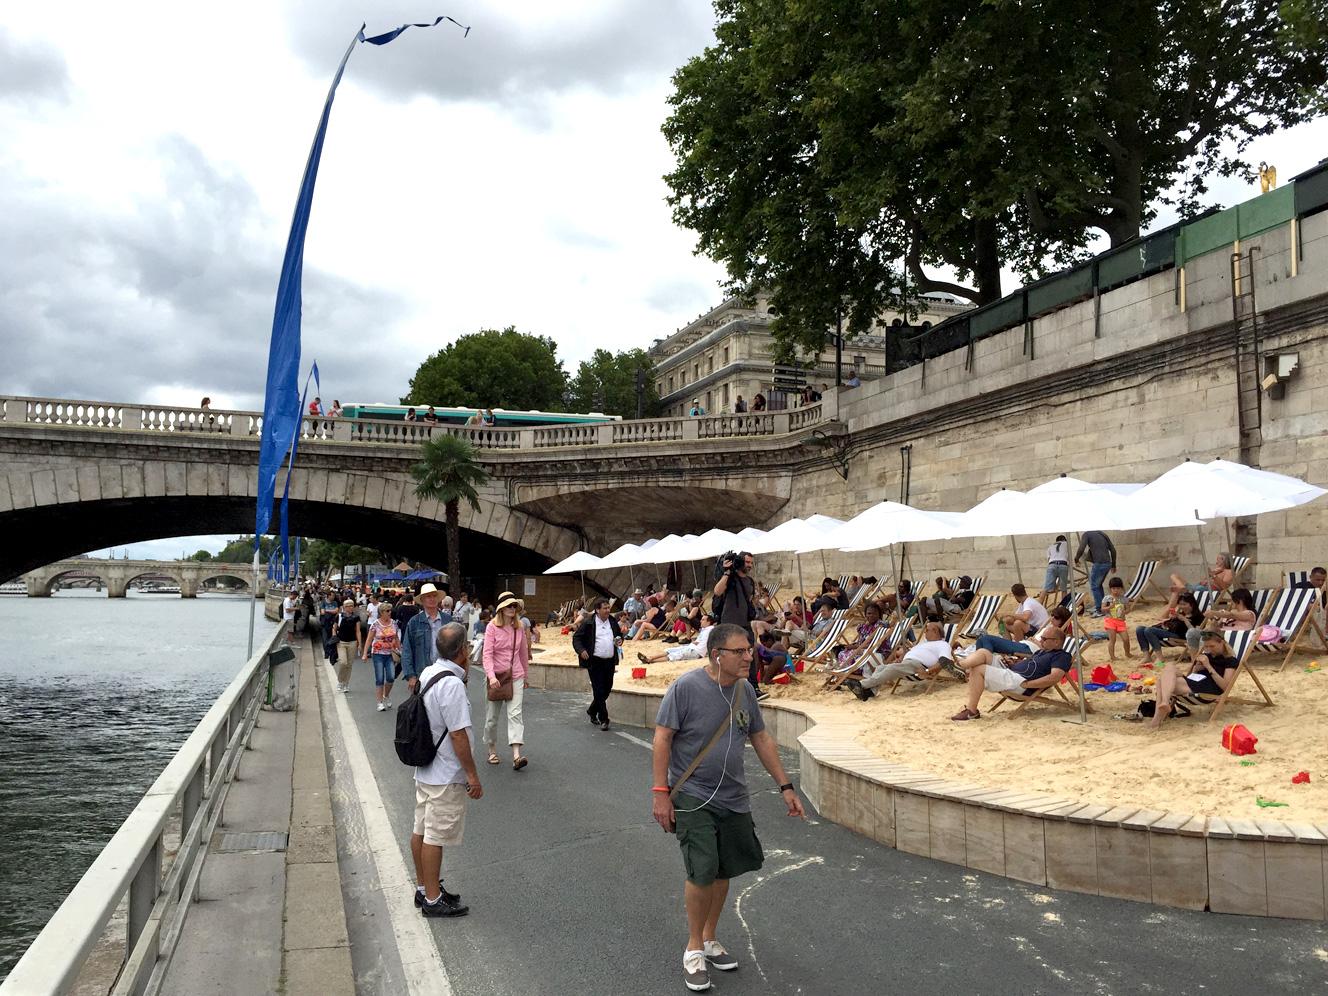 paris-plages-2015-2